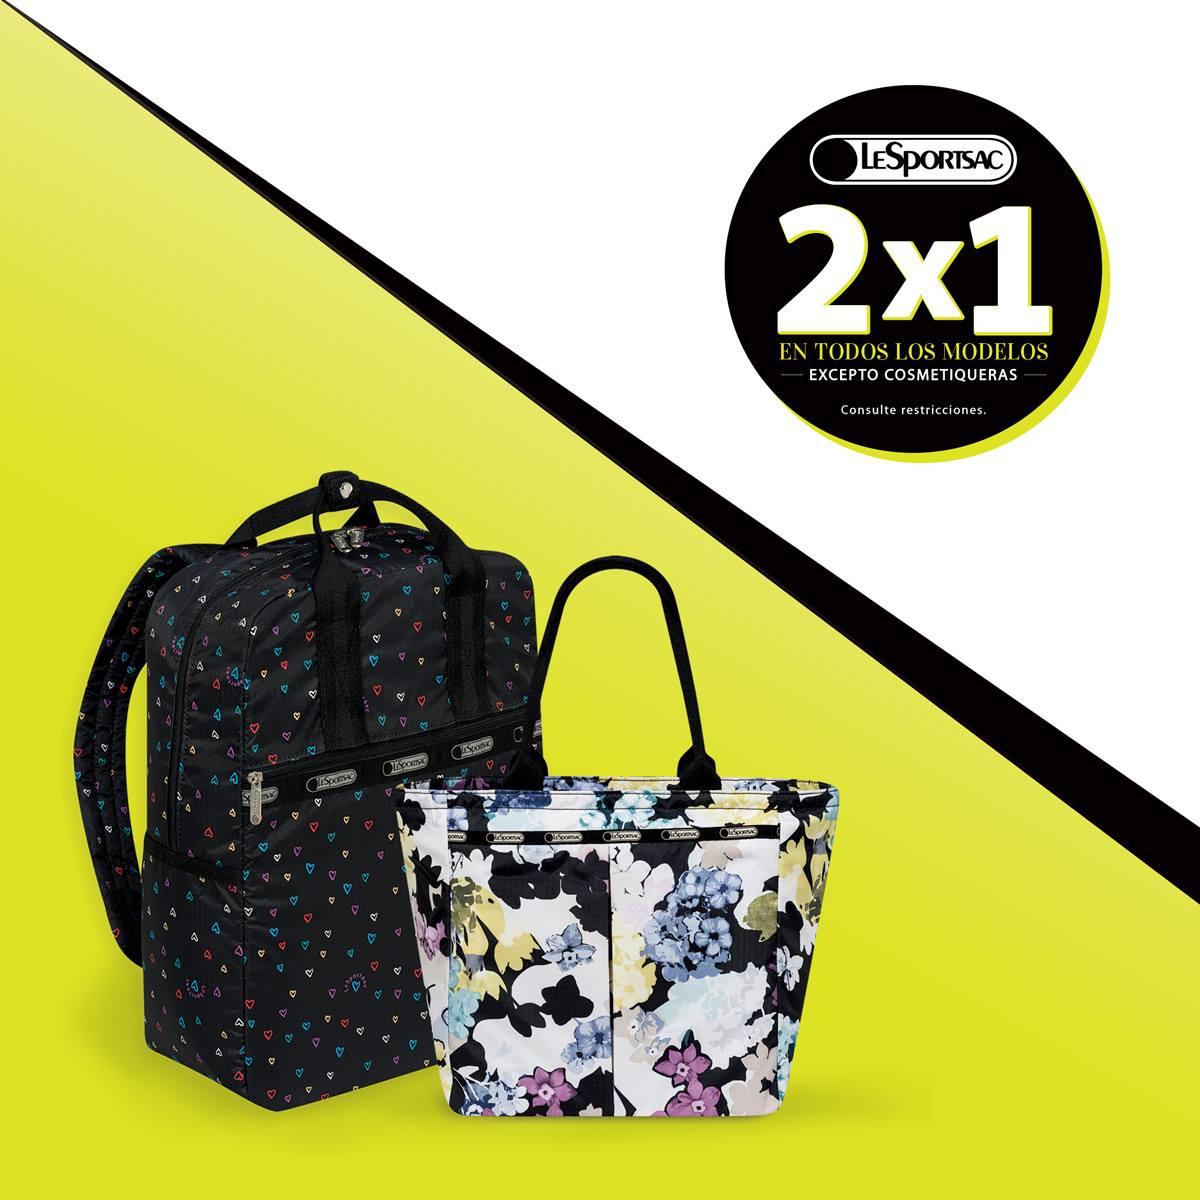 LesportSac: 2x1 en todas las bolsas